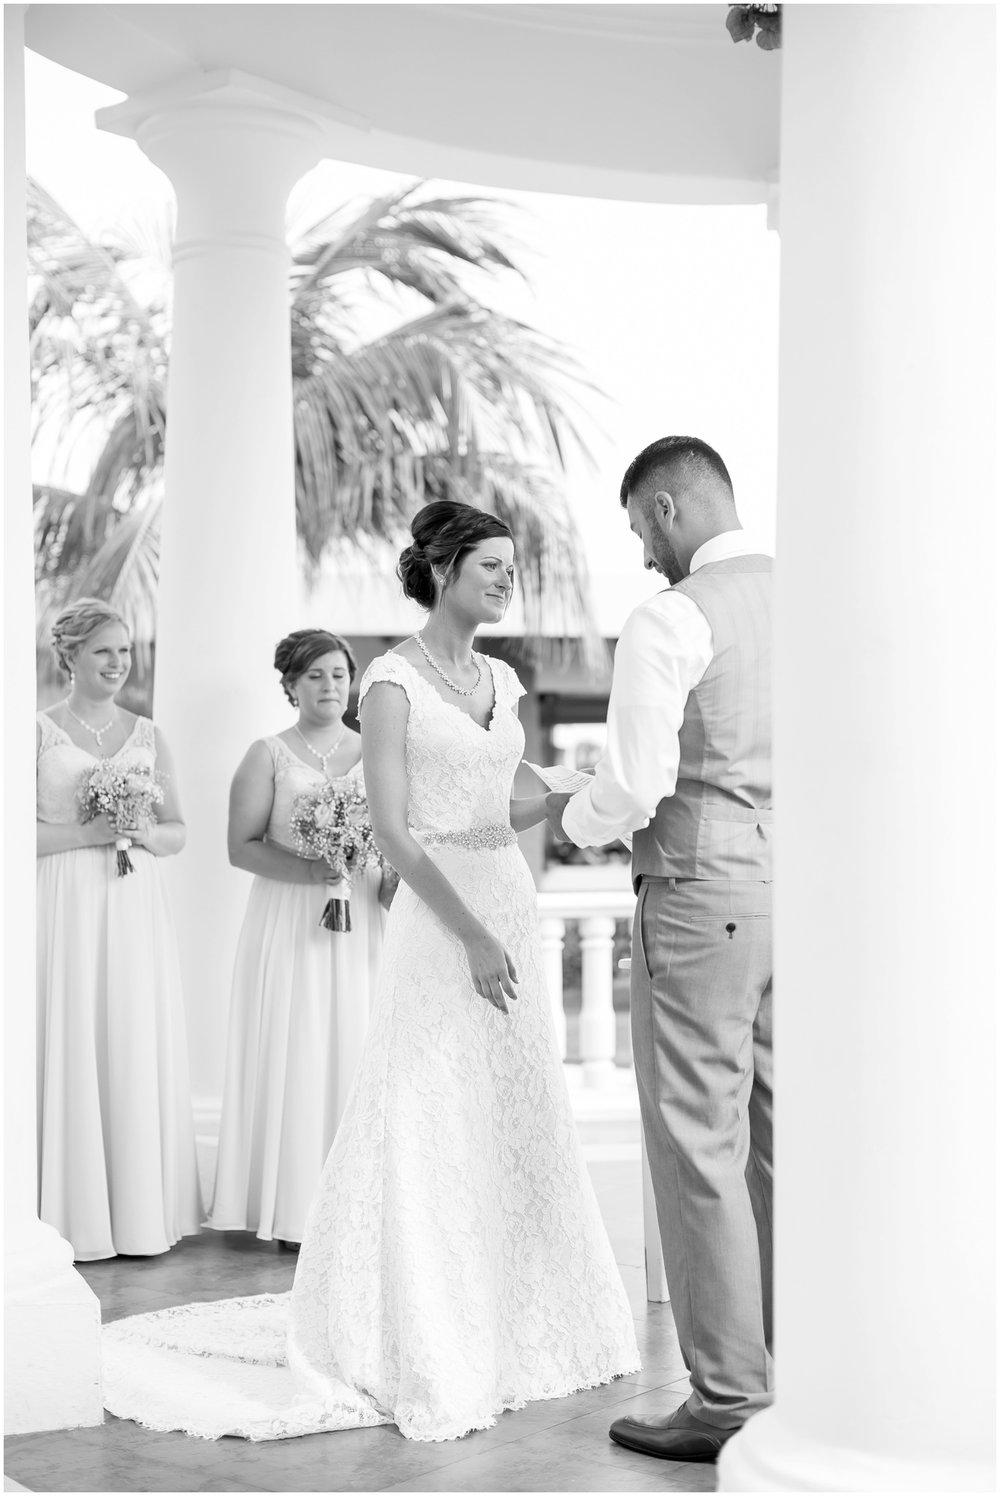 Riviera_Maya_Wedding_Barcelo_Palace_Destination_Photographer_2981.jpg